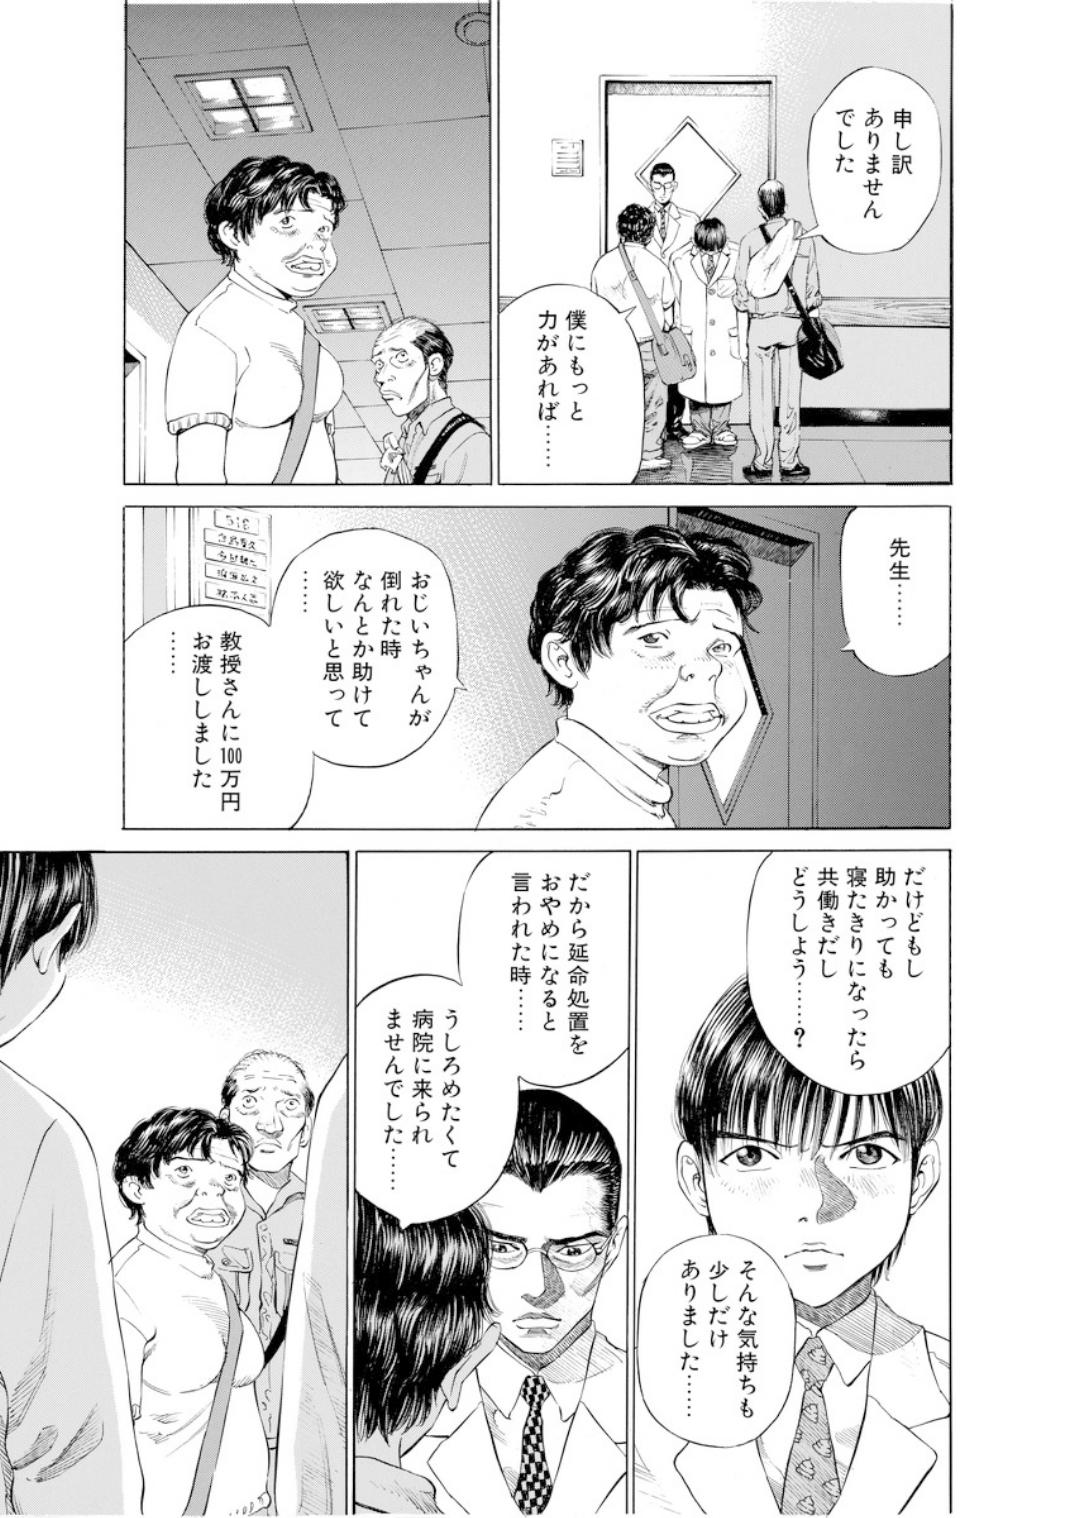 001bj_page-0139.jpg